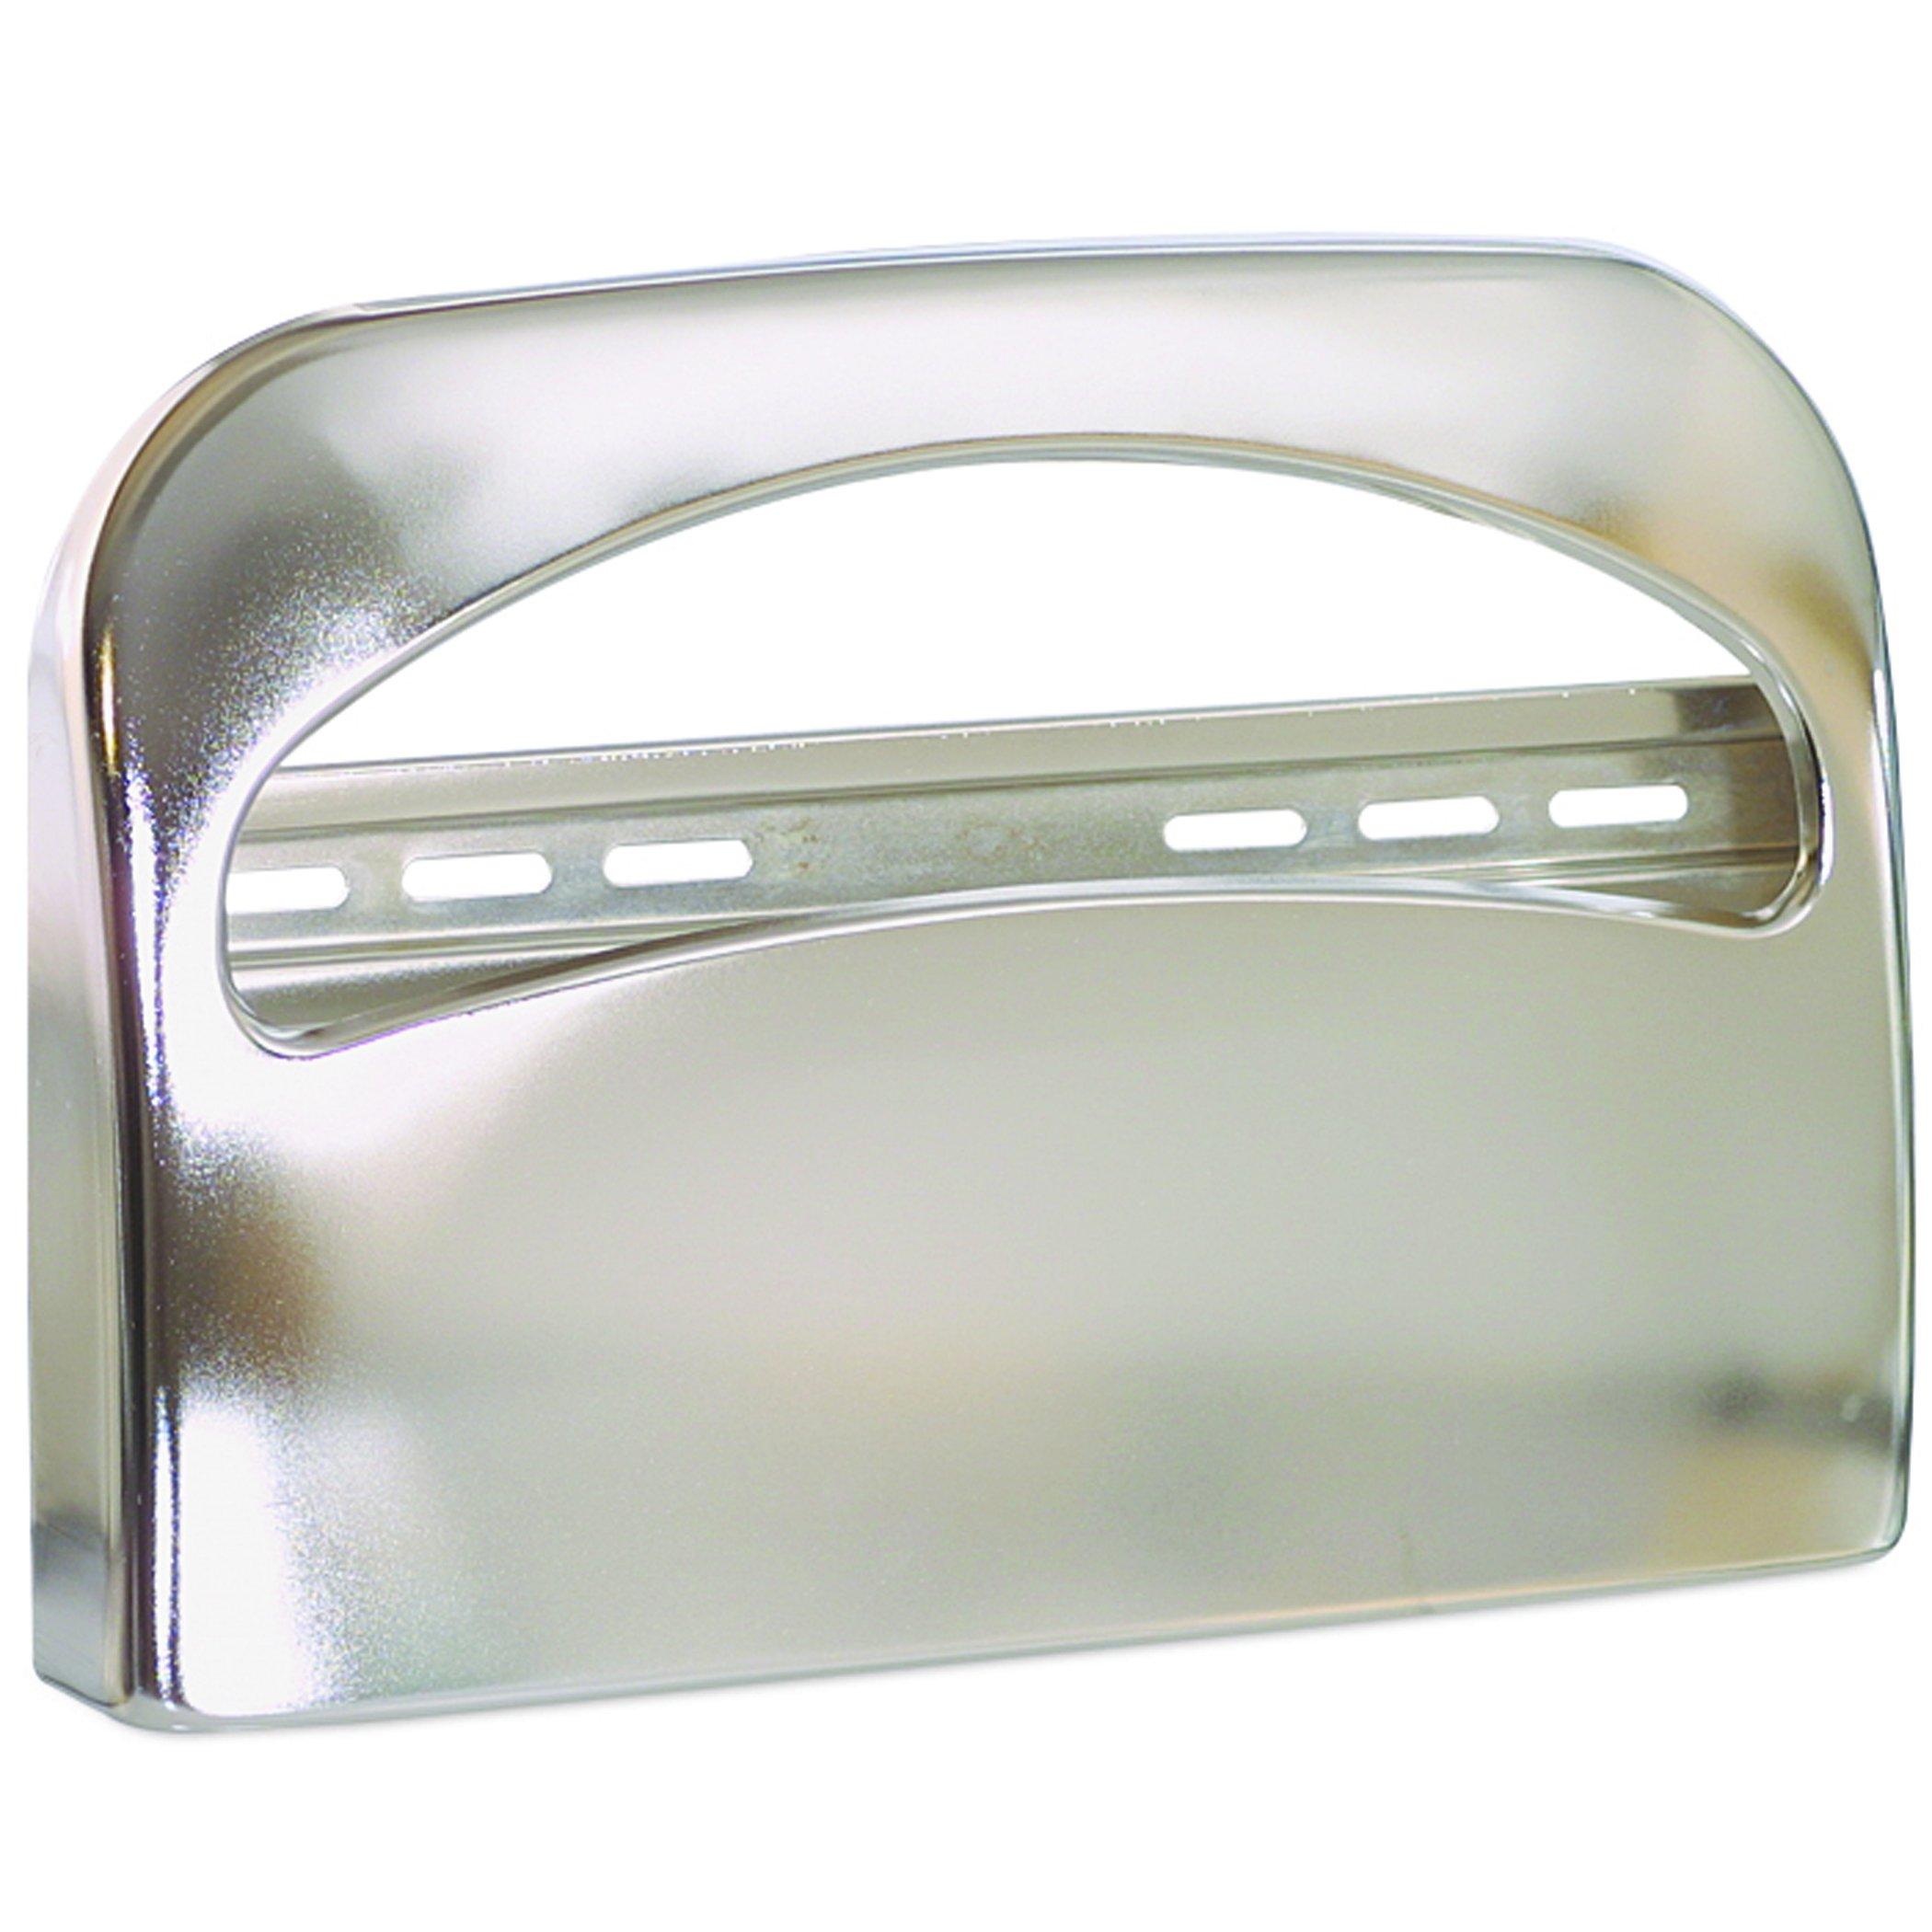 Georgia-Pacific 57725 Safe-T-Gard 1/2 Fold Toilet Seat Cover Dispenser, Chrome